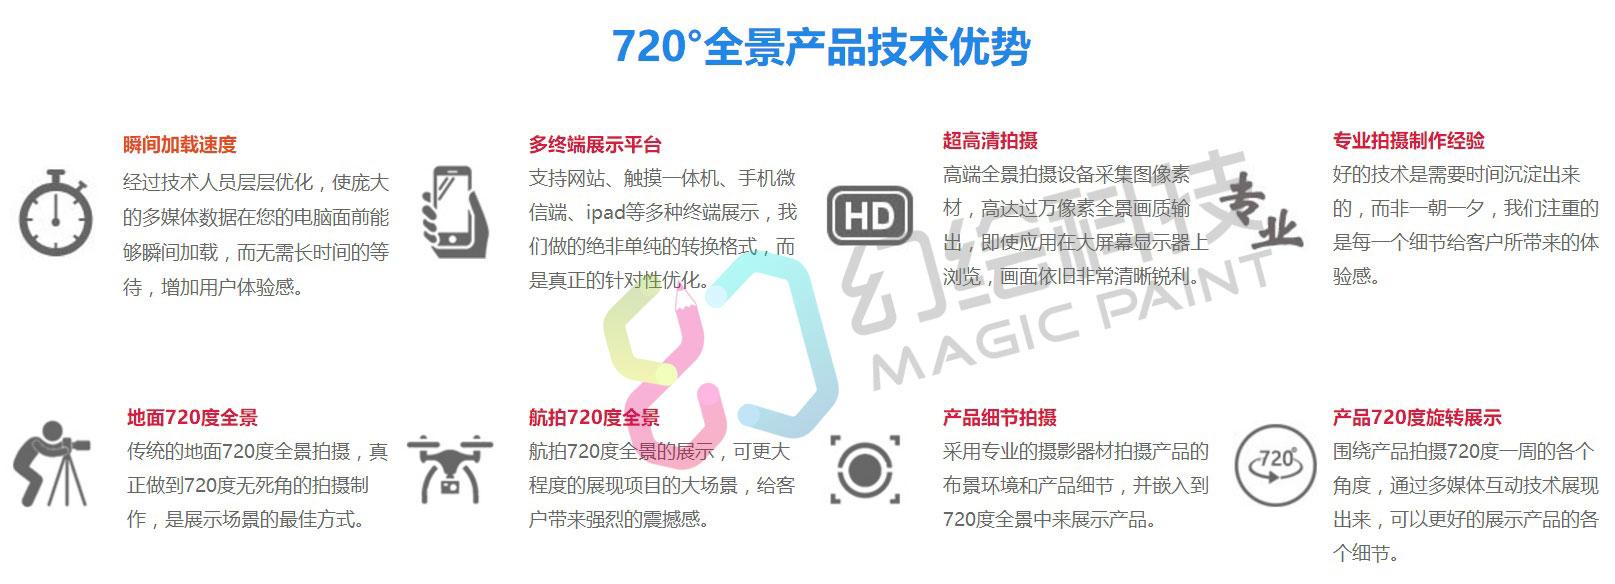 http://sem.g3img.com/g3img/huanhui168/c2_20180106104017_96228.jpg